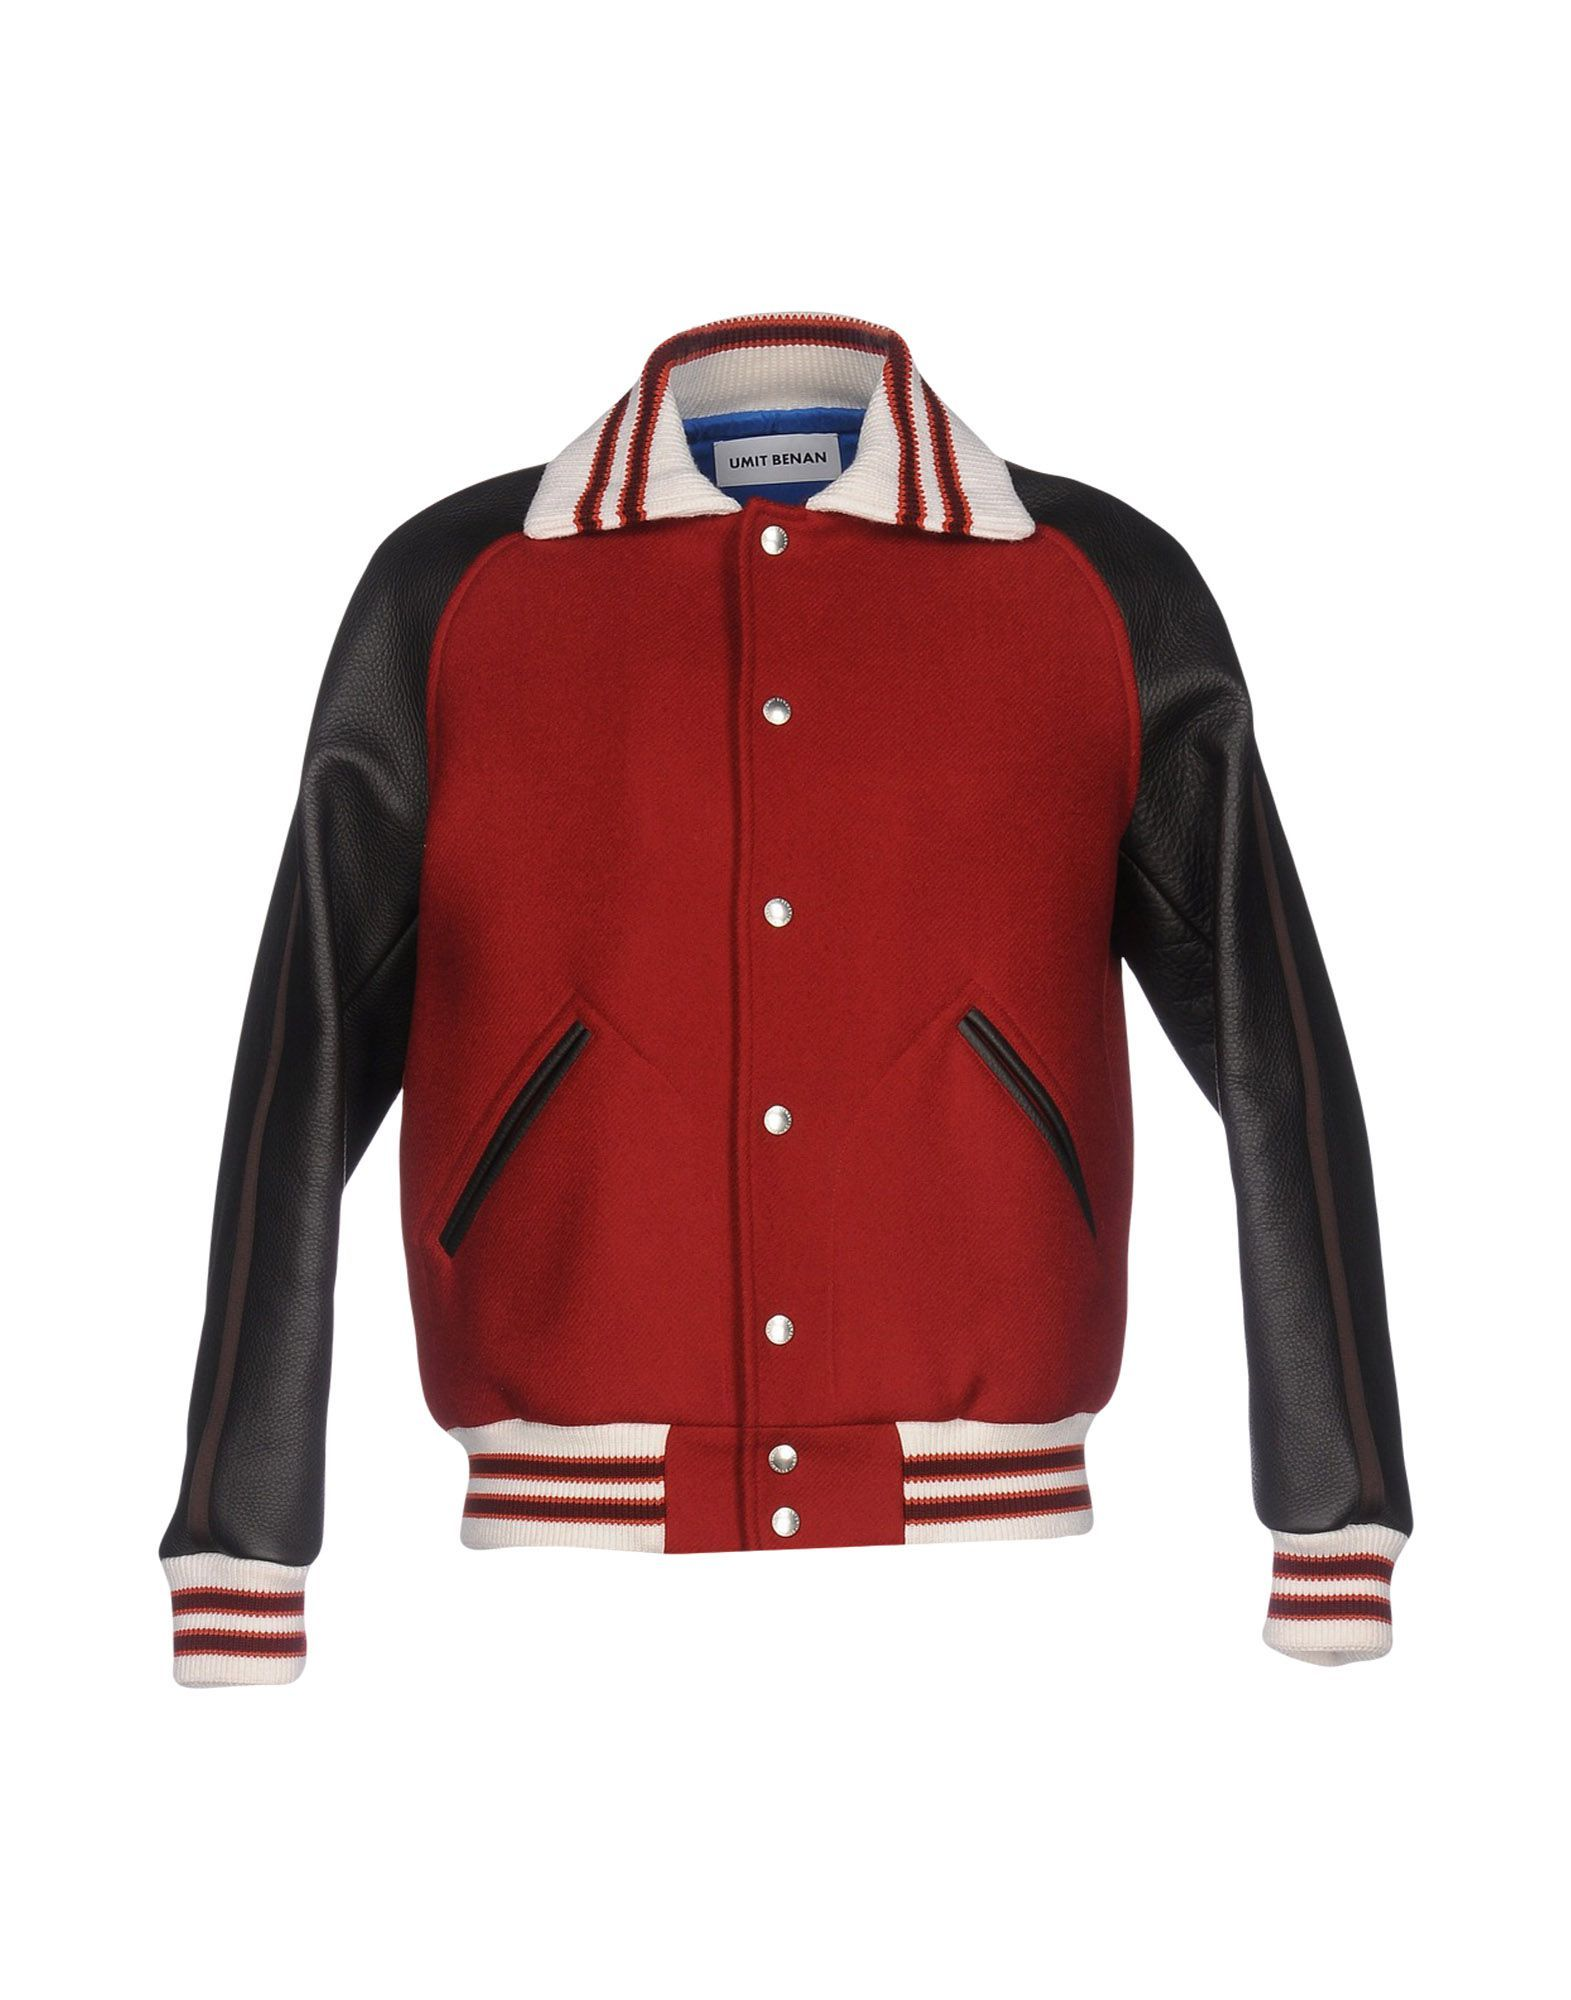 Umit Benan Brick Red Leather And Virgin Wool Bomber Jacket